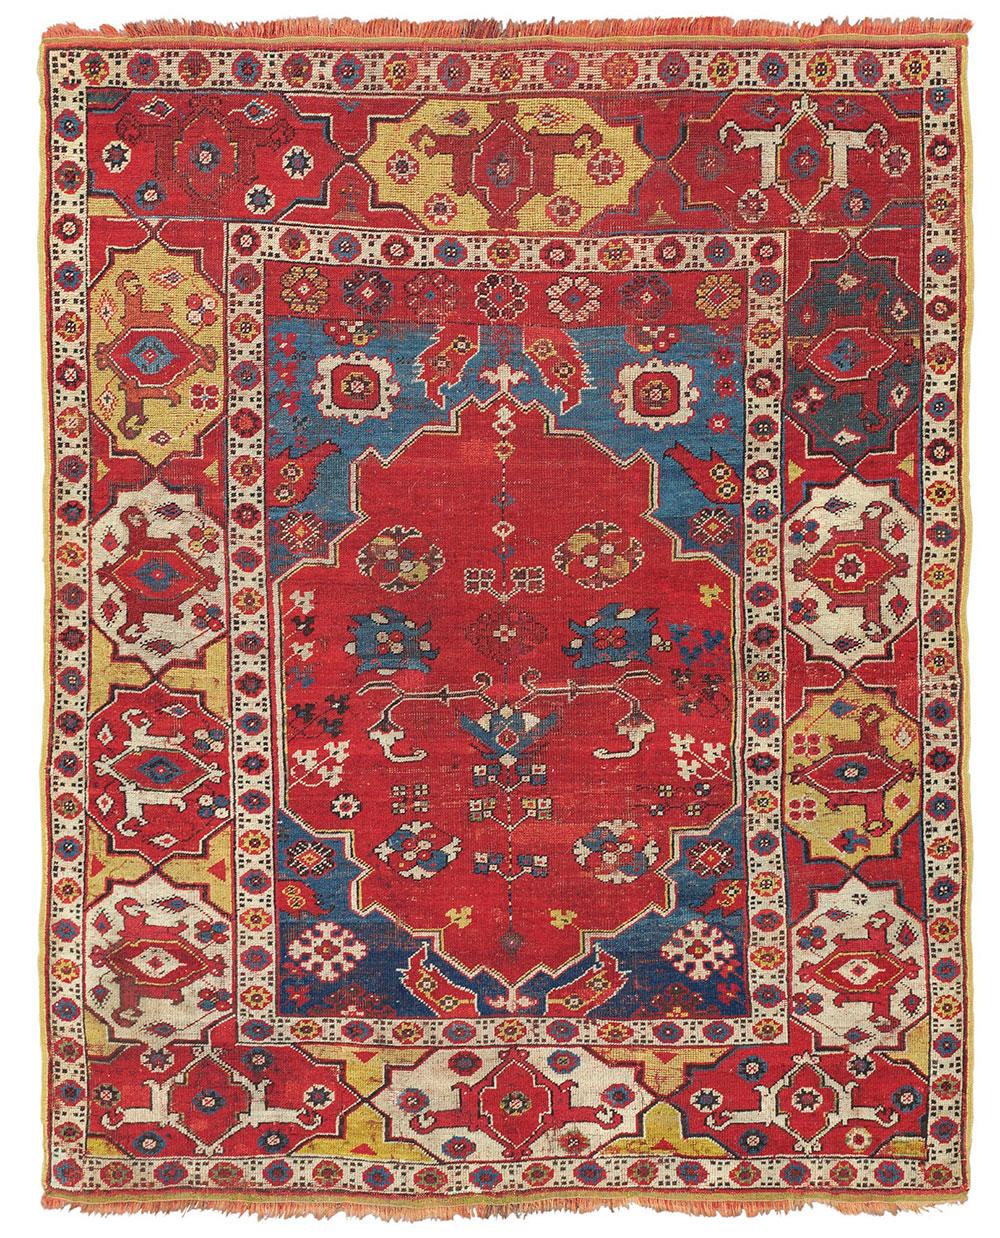 Oriental Carpet S London